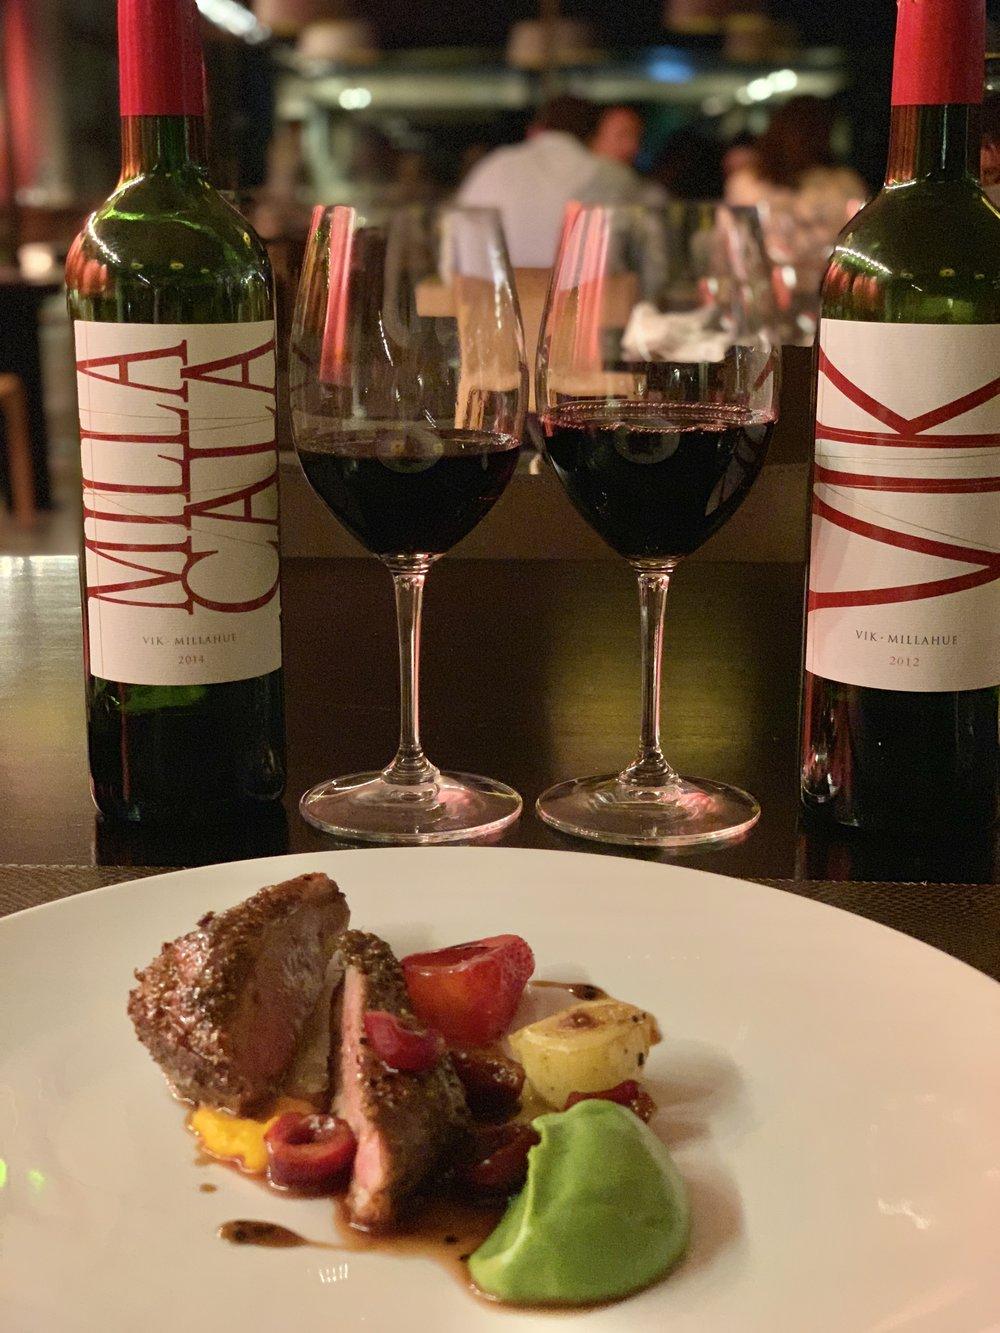 Vina VIK | VIK Retreat | Millahue | Chile